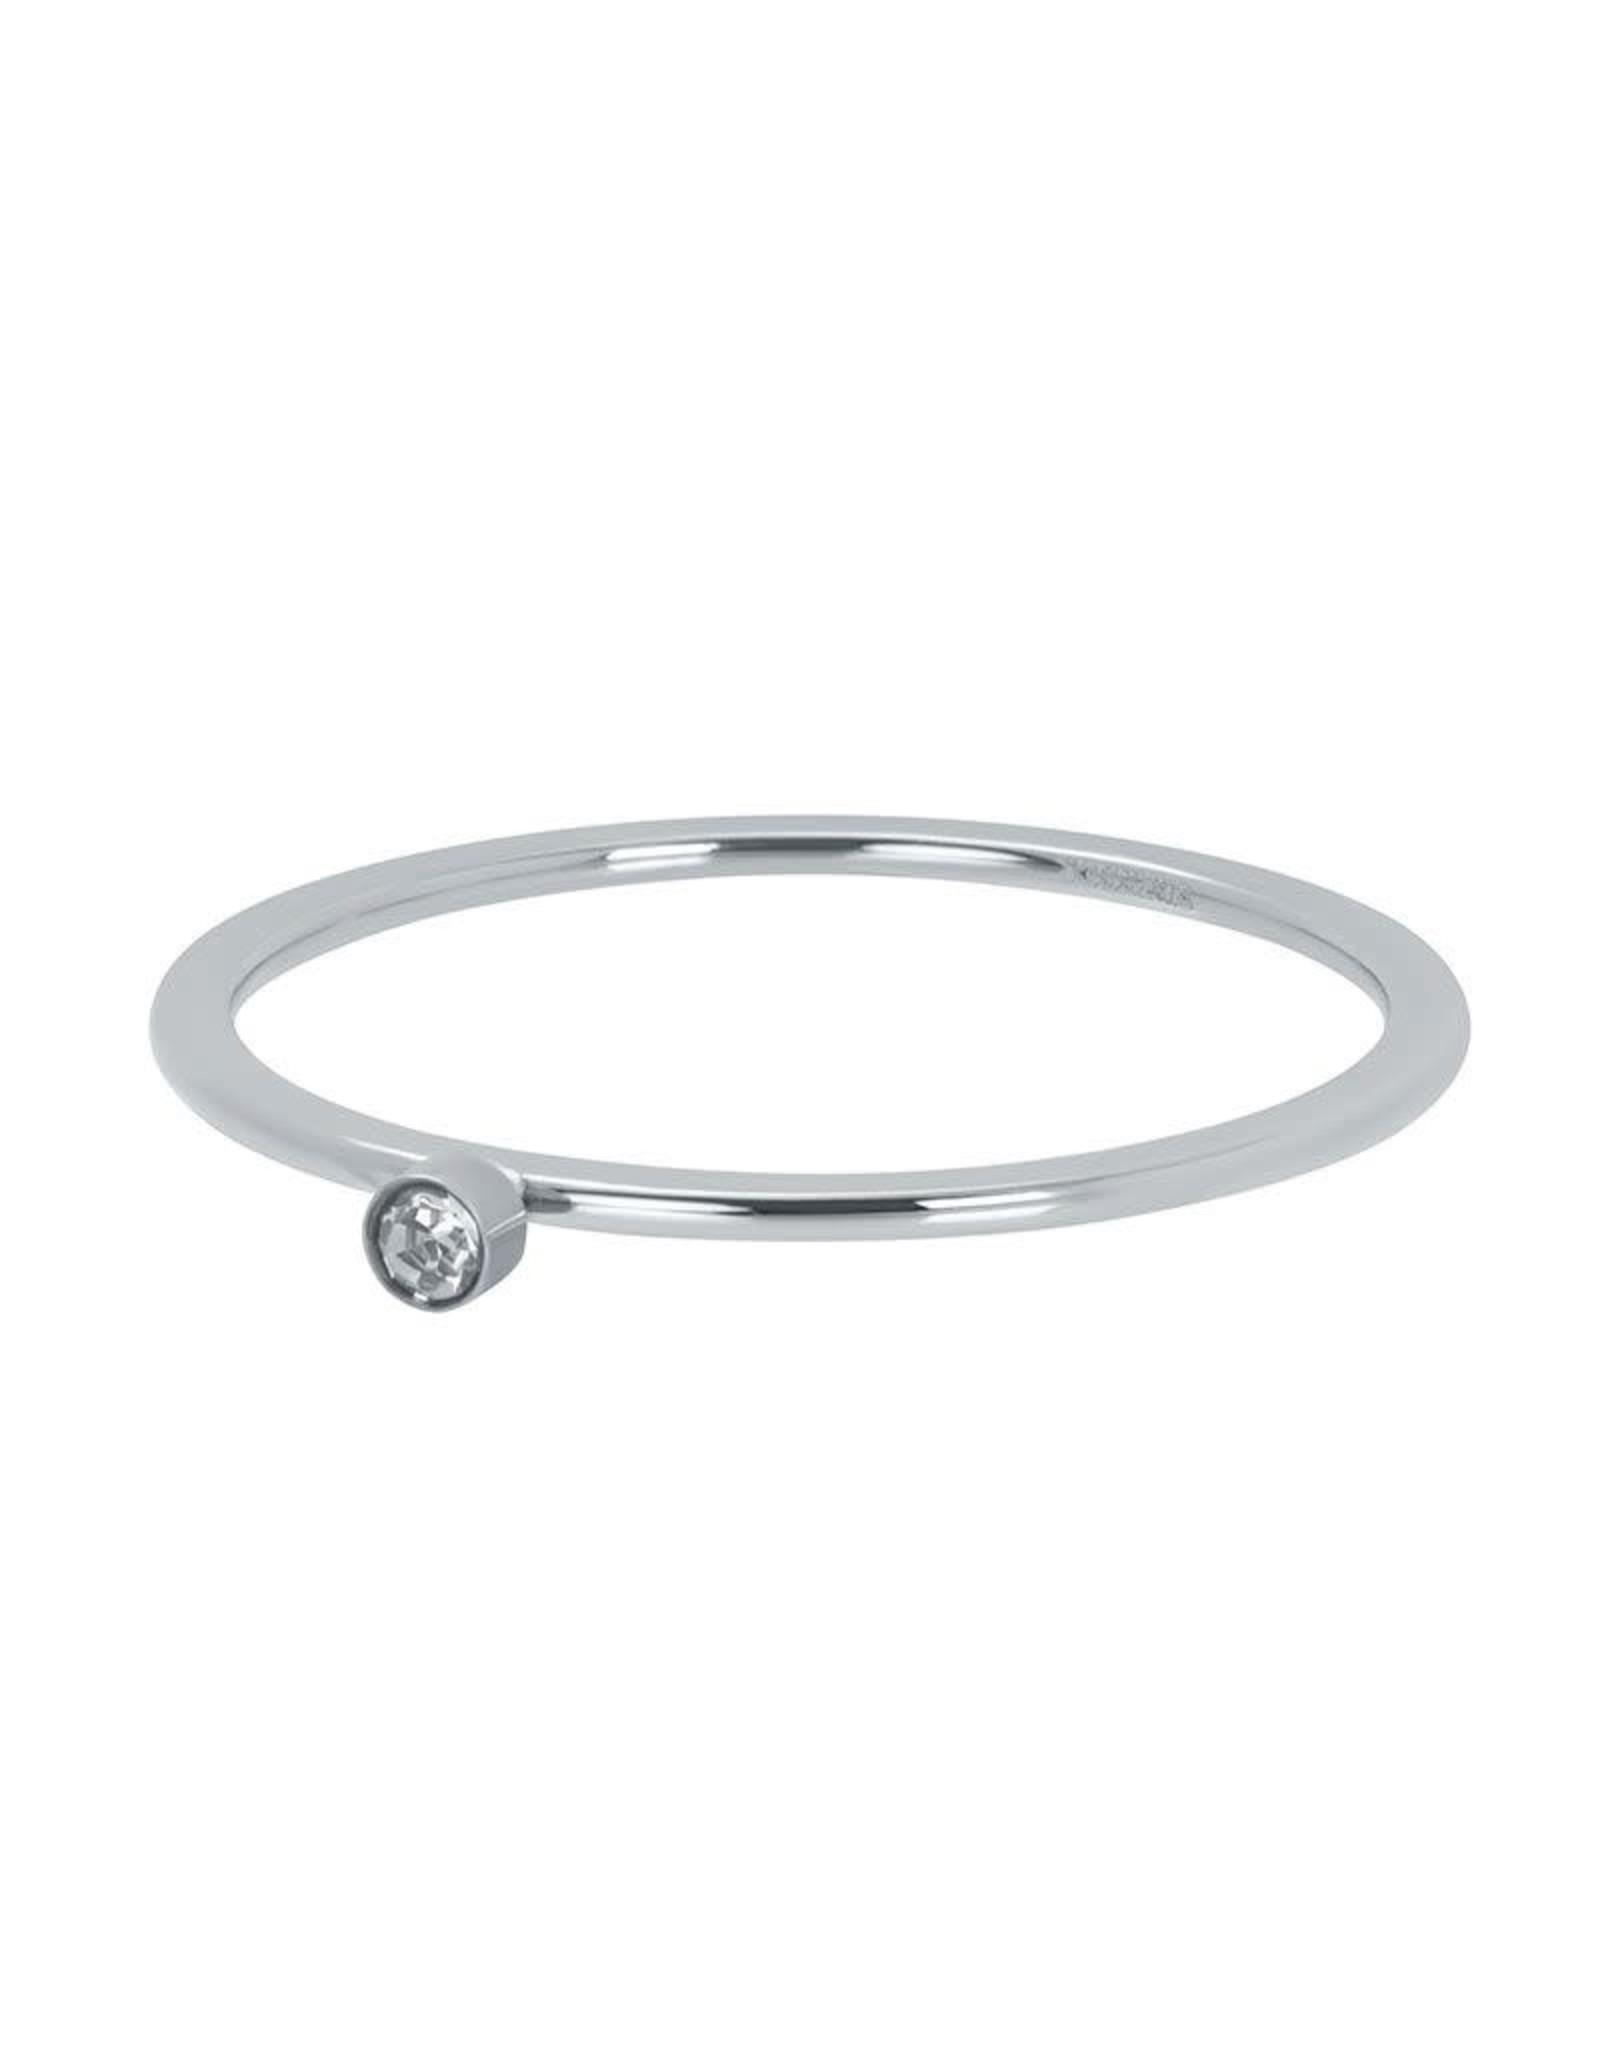 IXXXI IXXXI Zirconia 1 Stone Crystal ring Silver